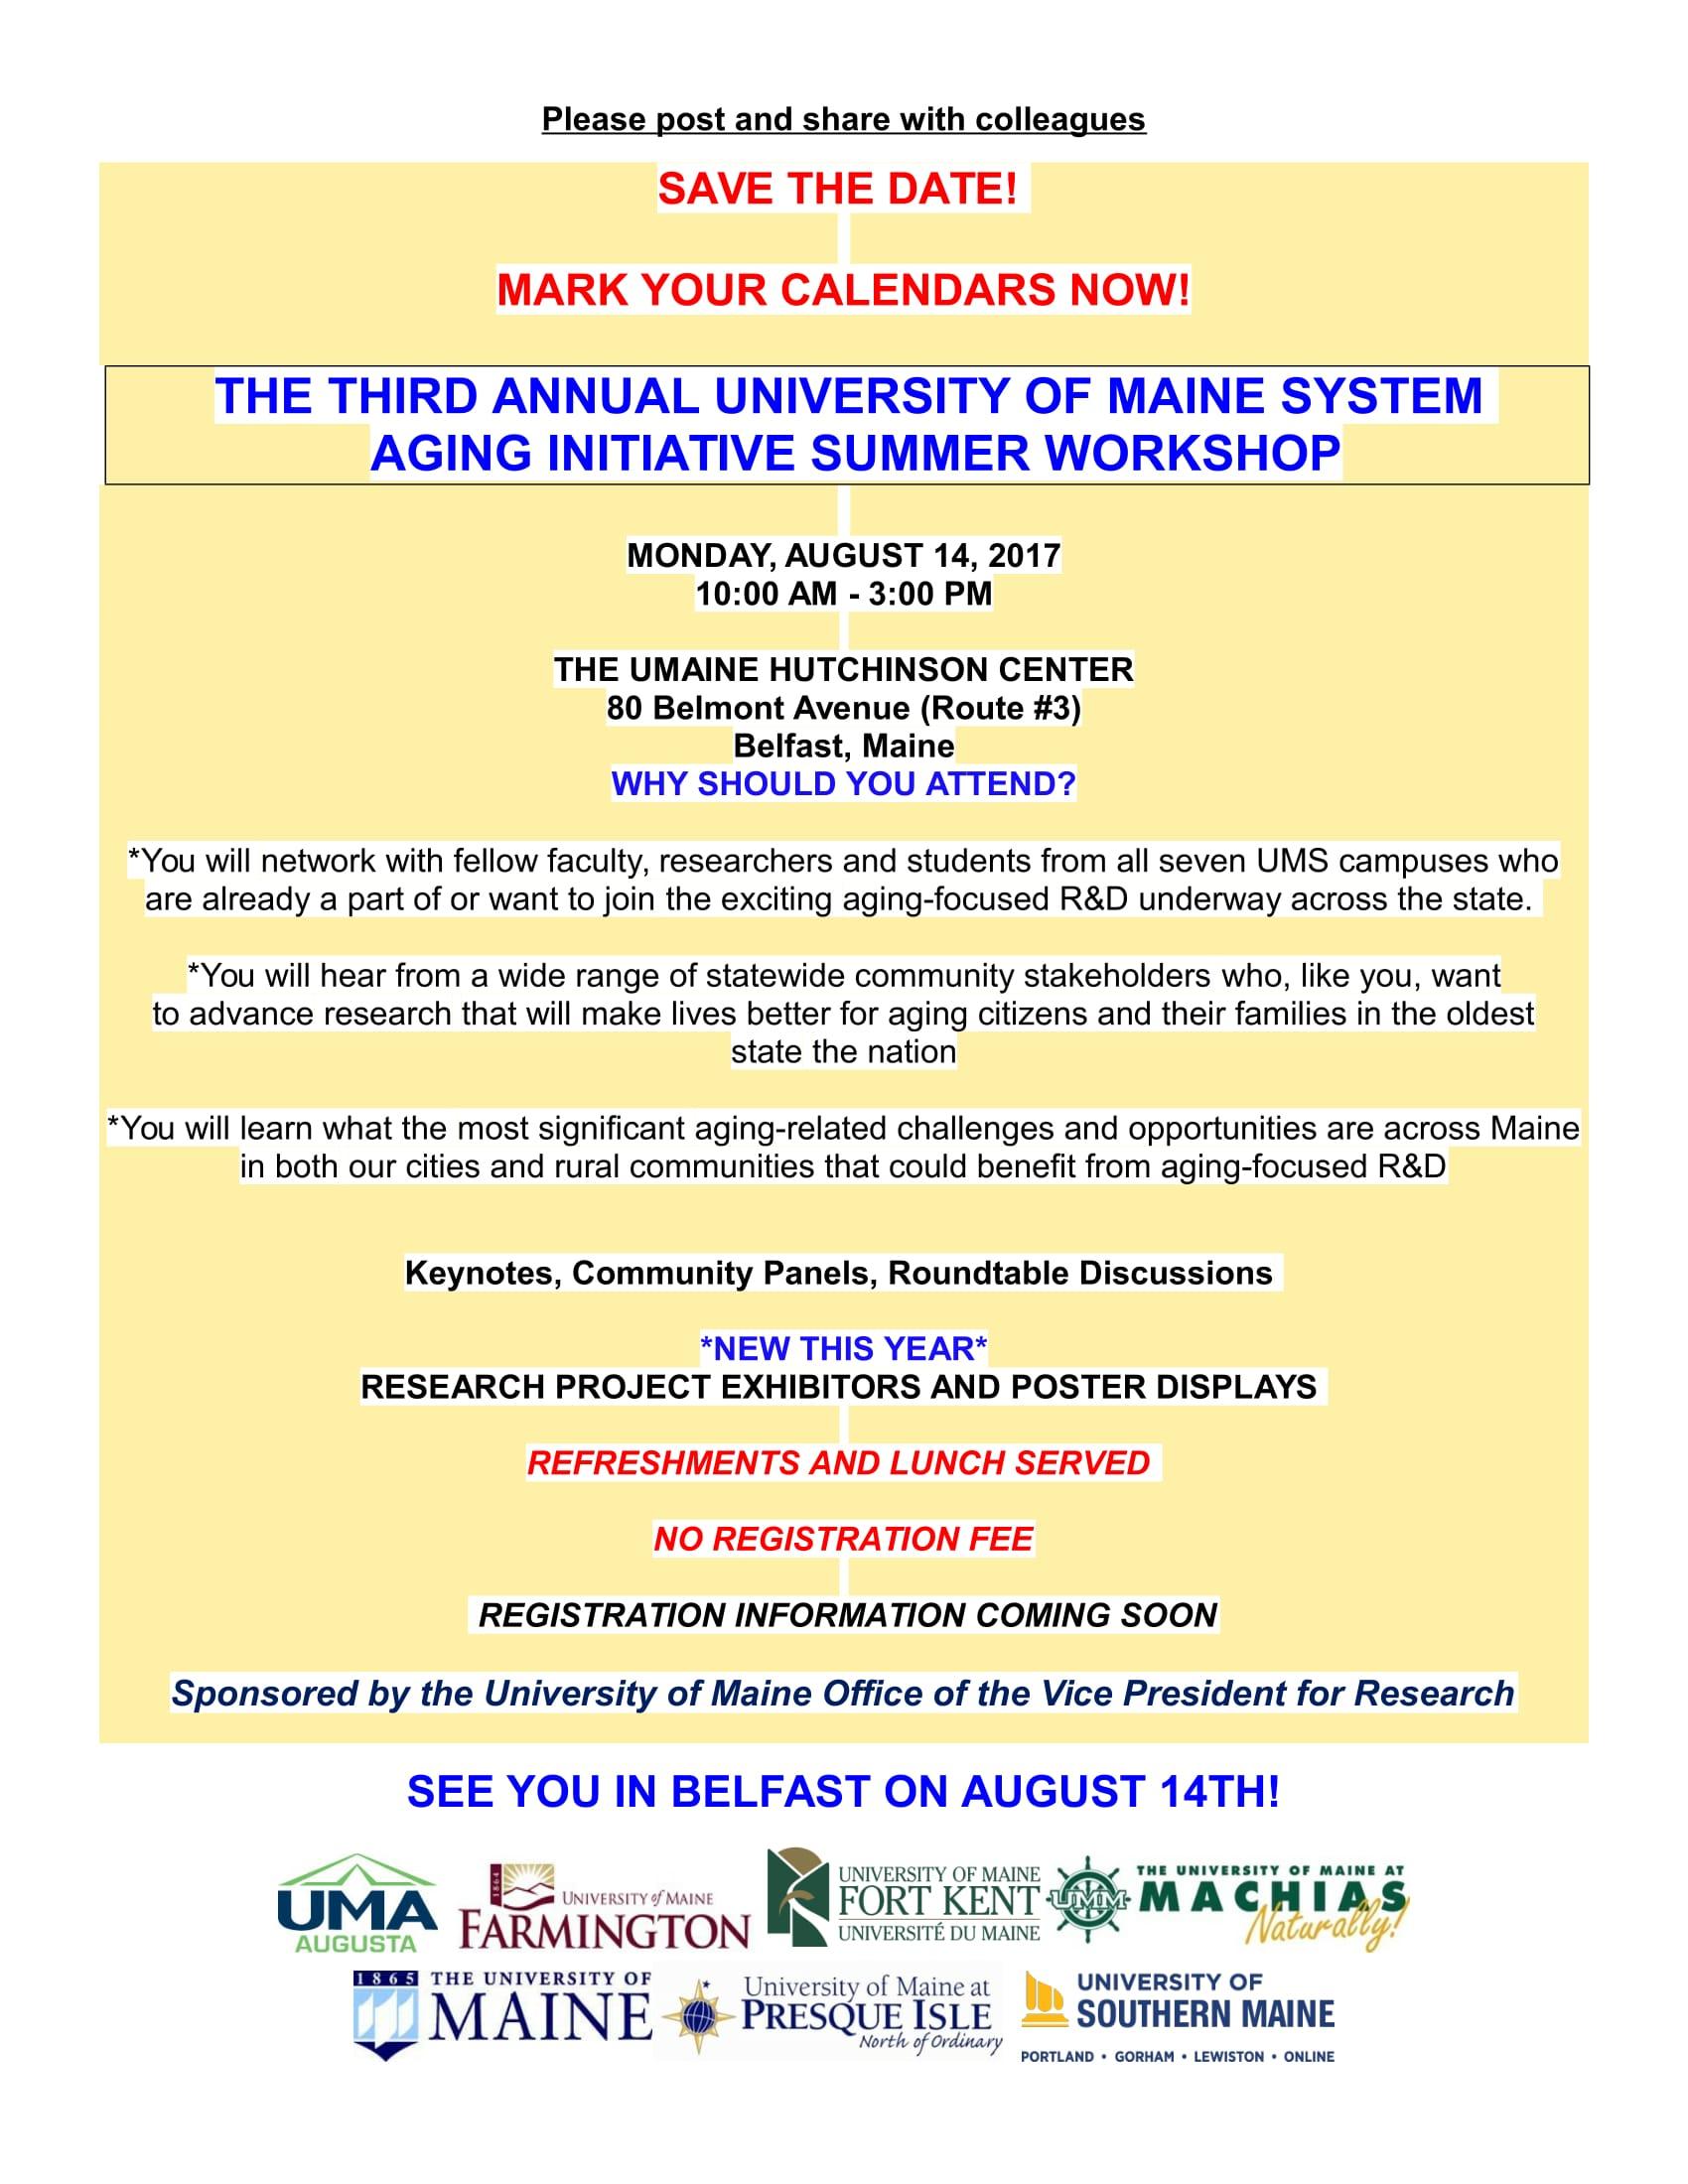 UMS Aging Initiative Workshop 8-14-17